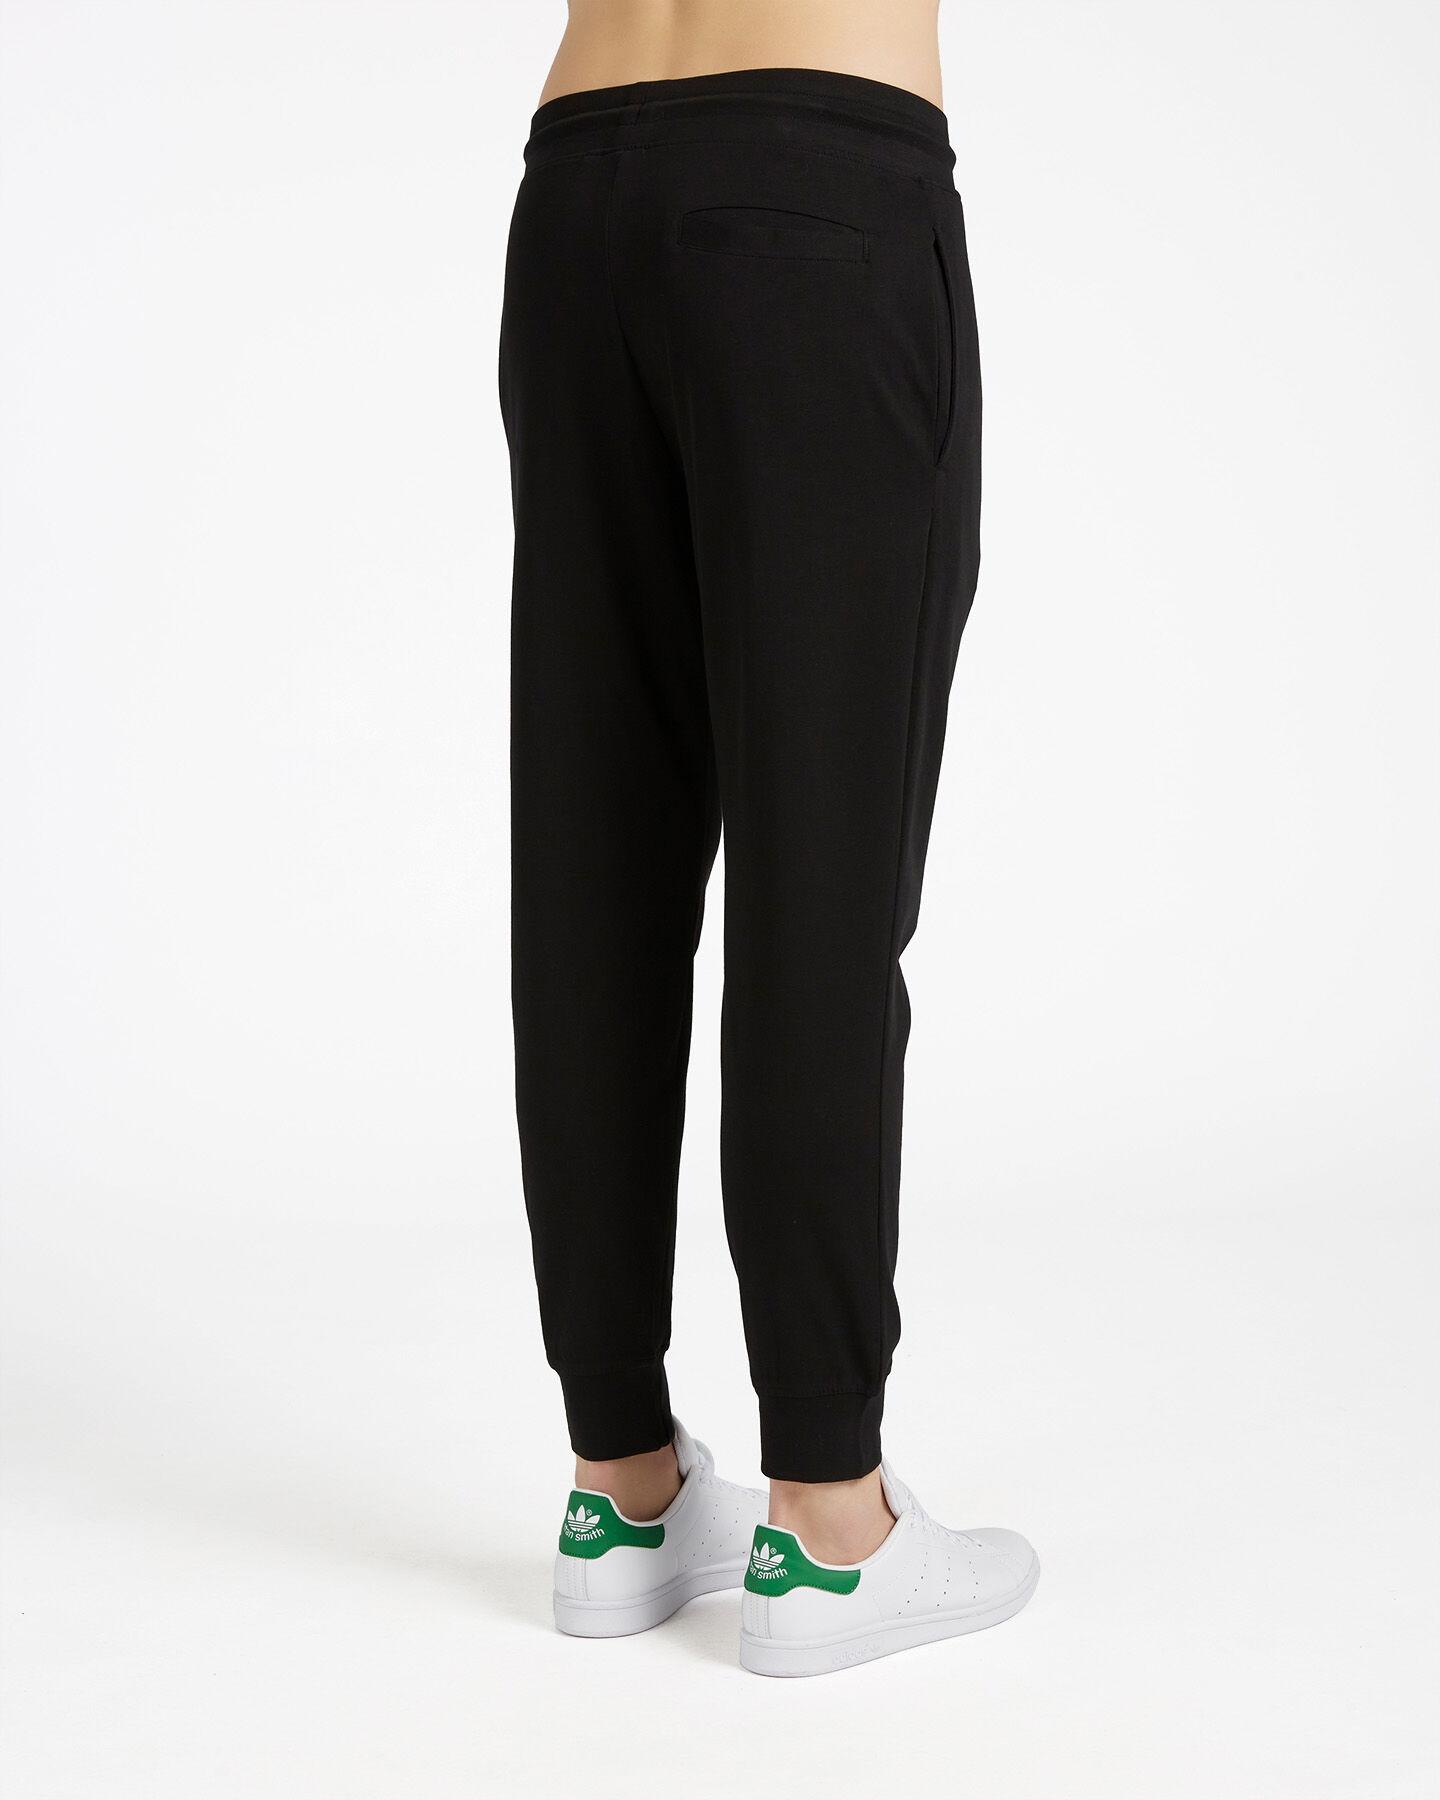 Pantalone ELLESSE BASIC M S4087821 scatto 1